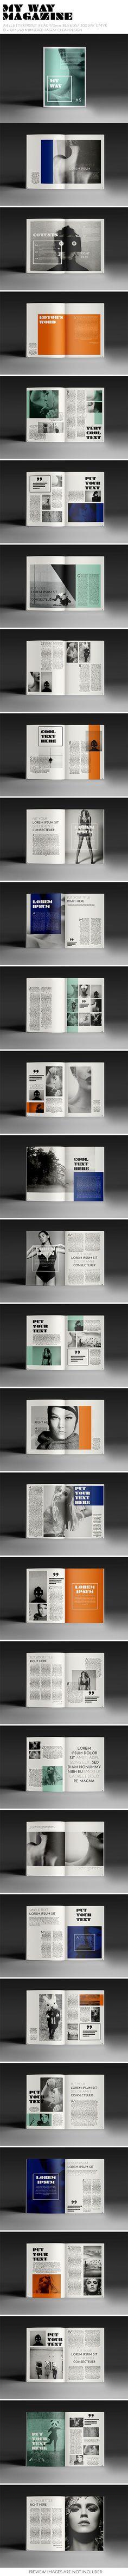 My Way Magazine - crew55design